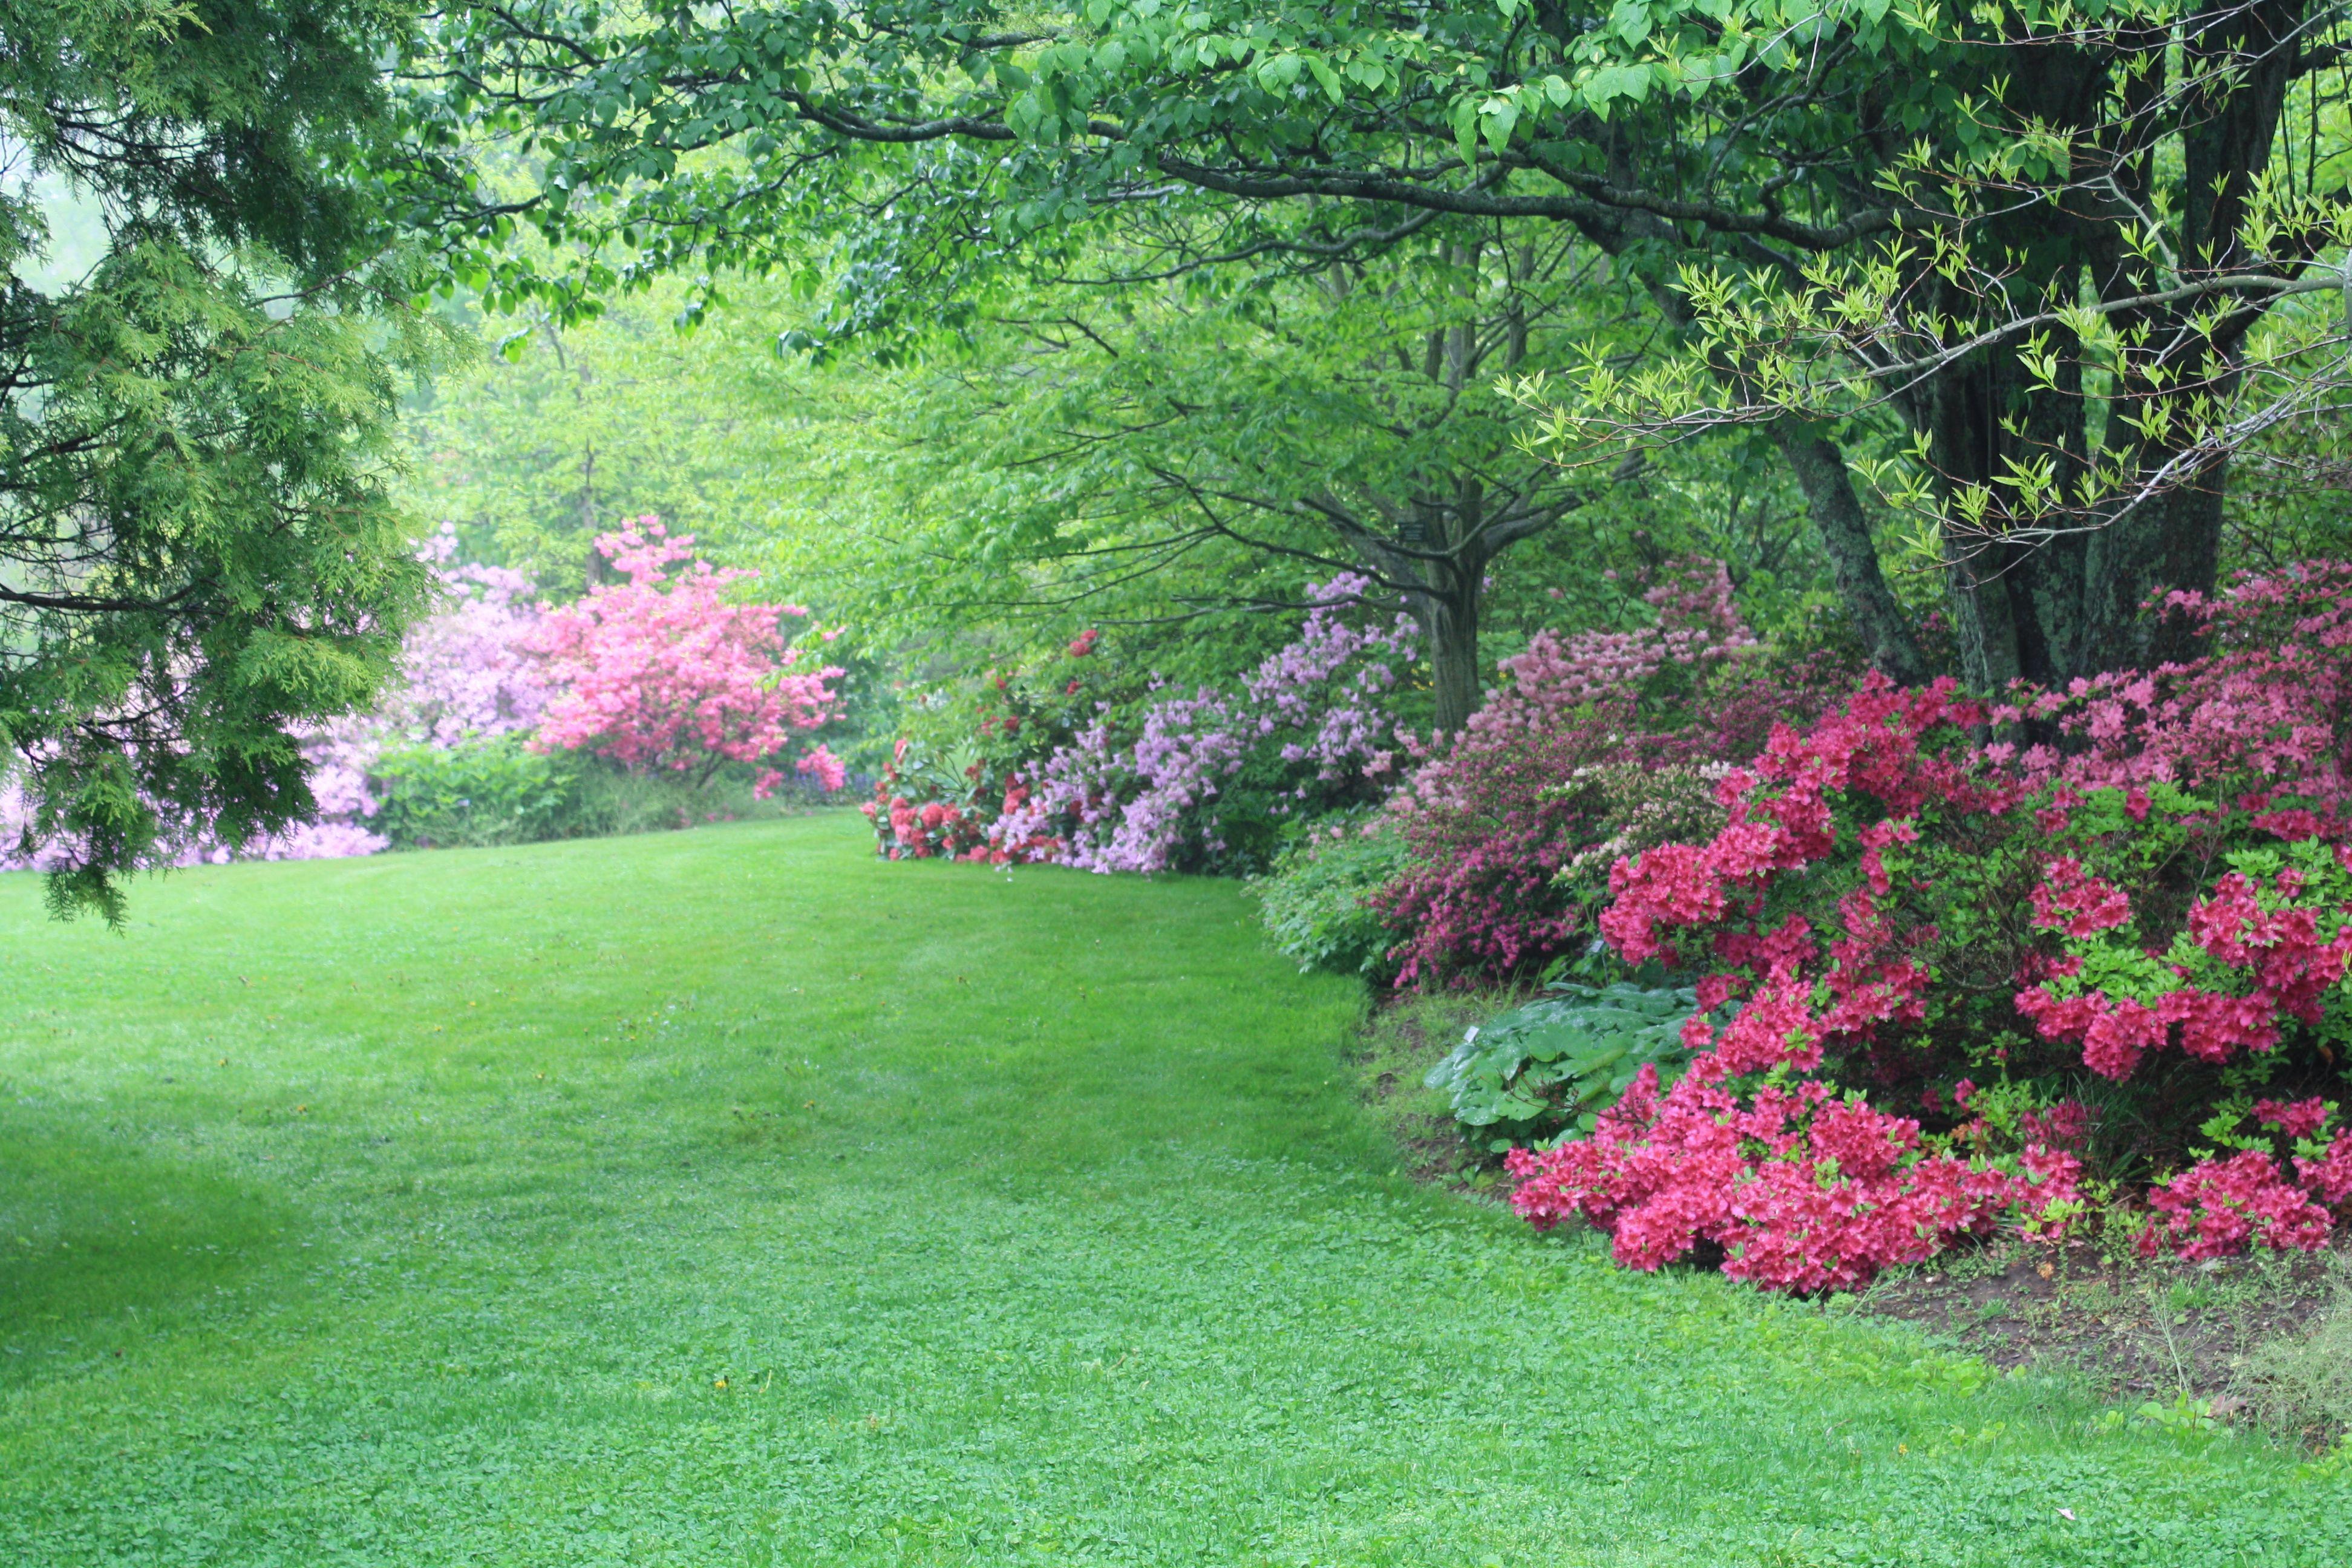 Powers Cultivates Sense Of Community At Backyard Farmer Garden Nebraska Today University Of Nebraska Lincoln